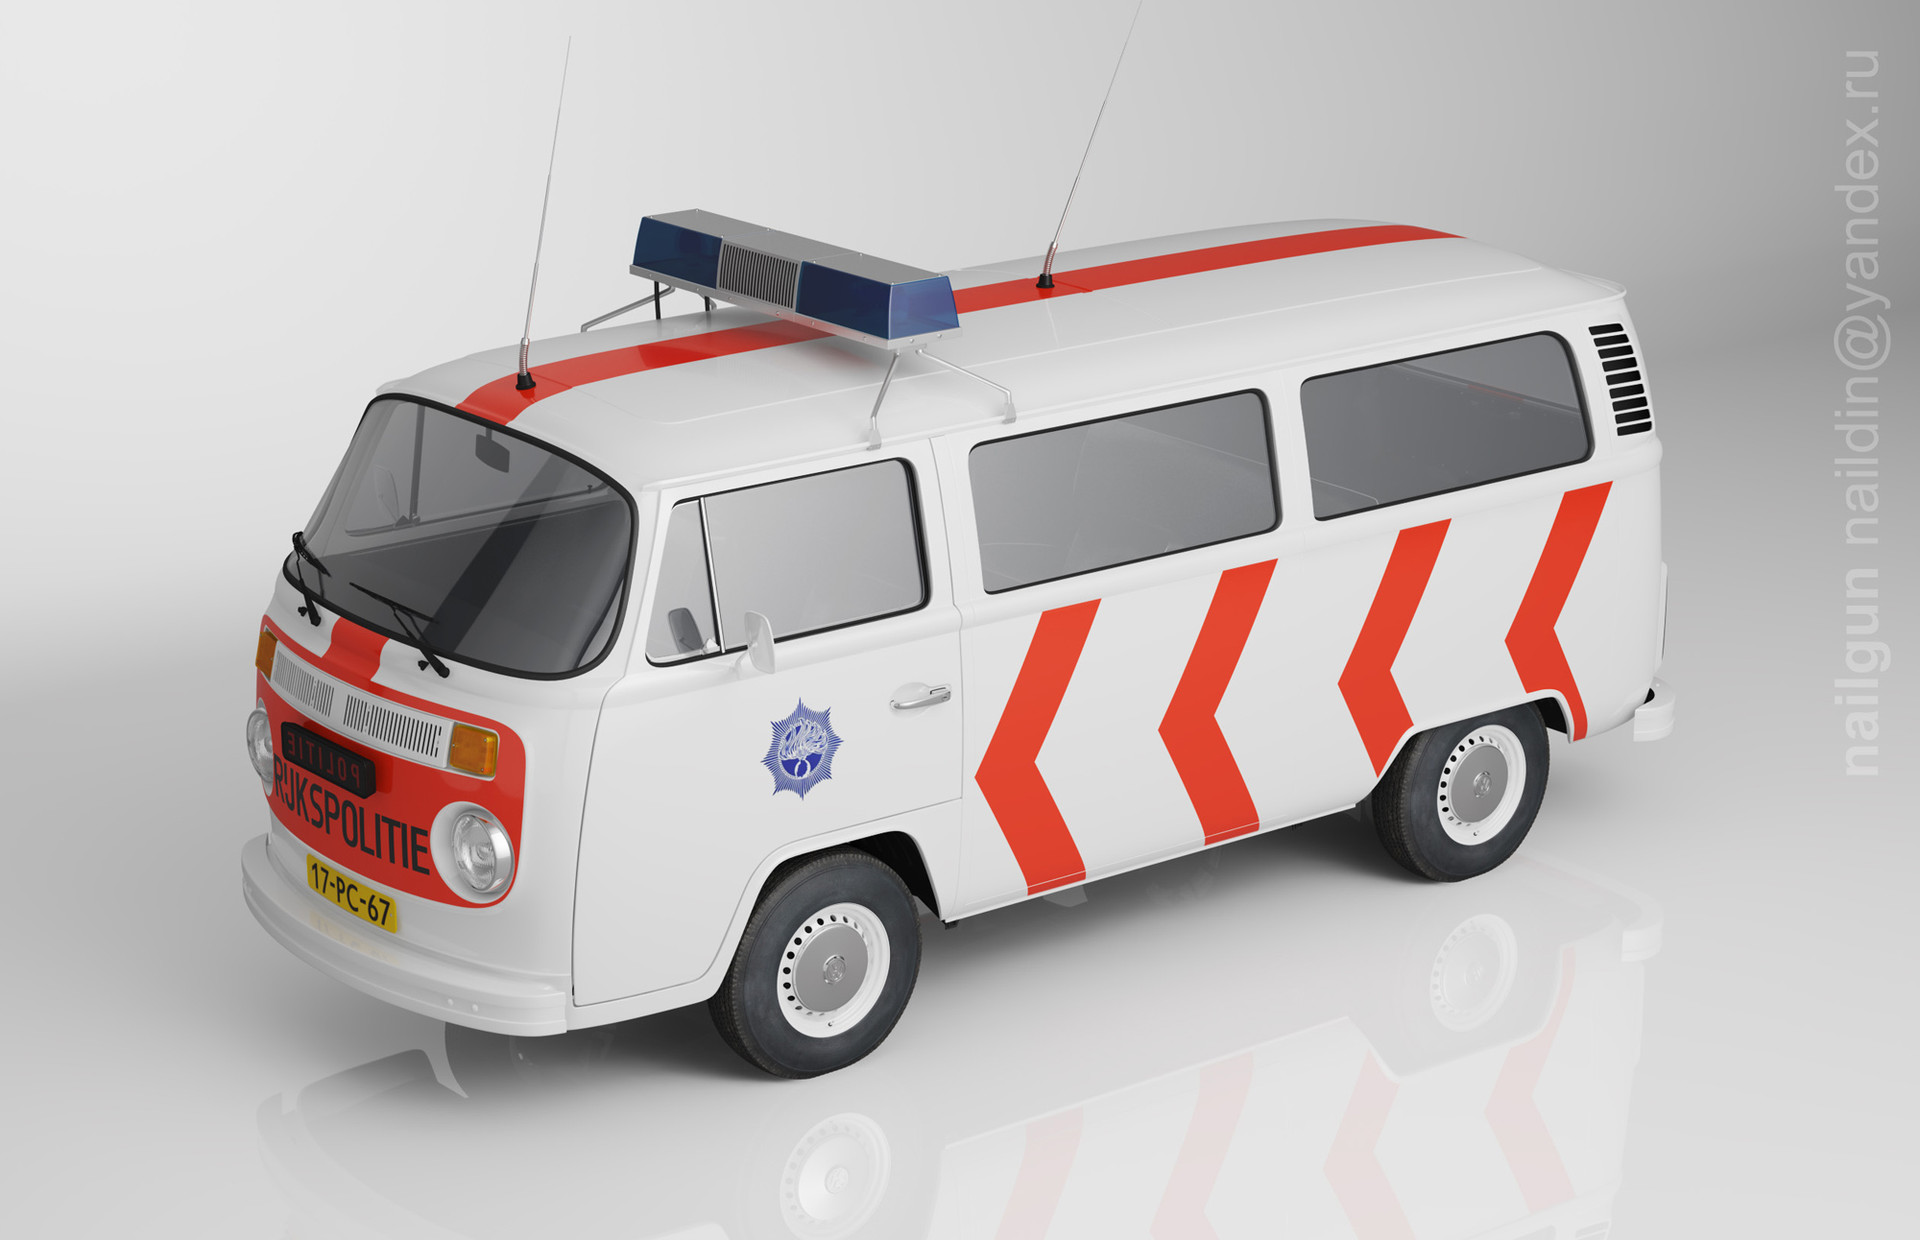 Nail khusnutdinov pwc 017 000 vw transporter t2 miniature